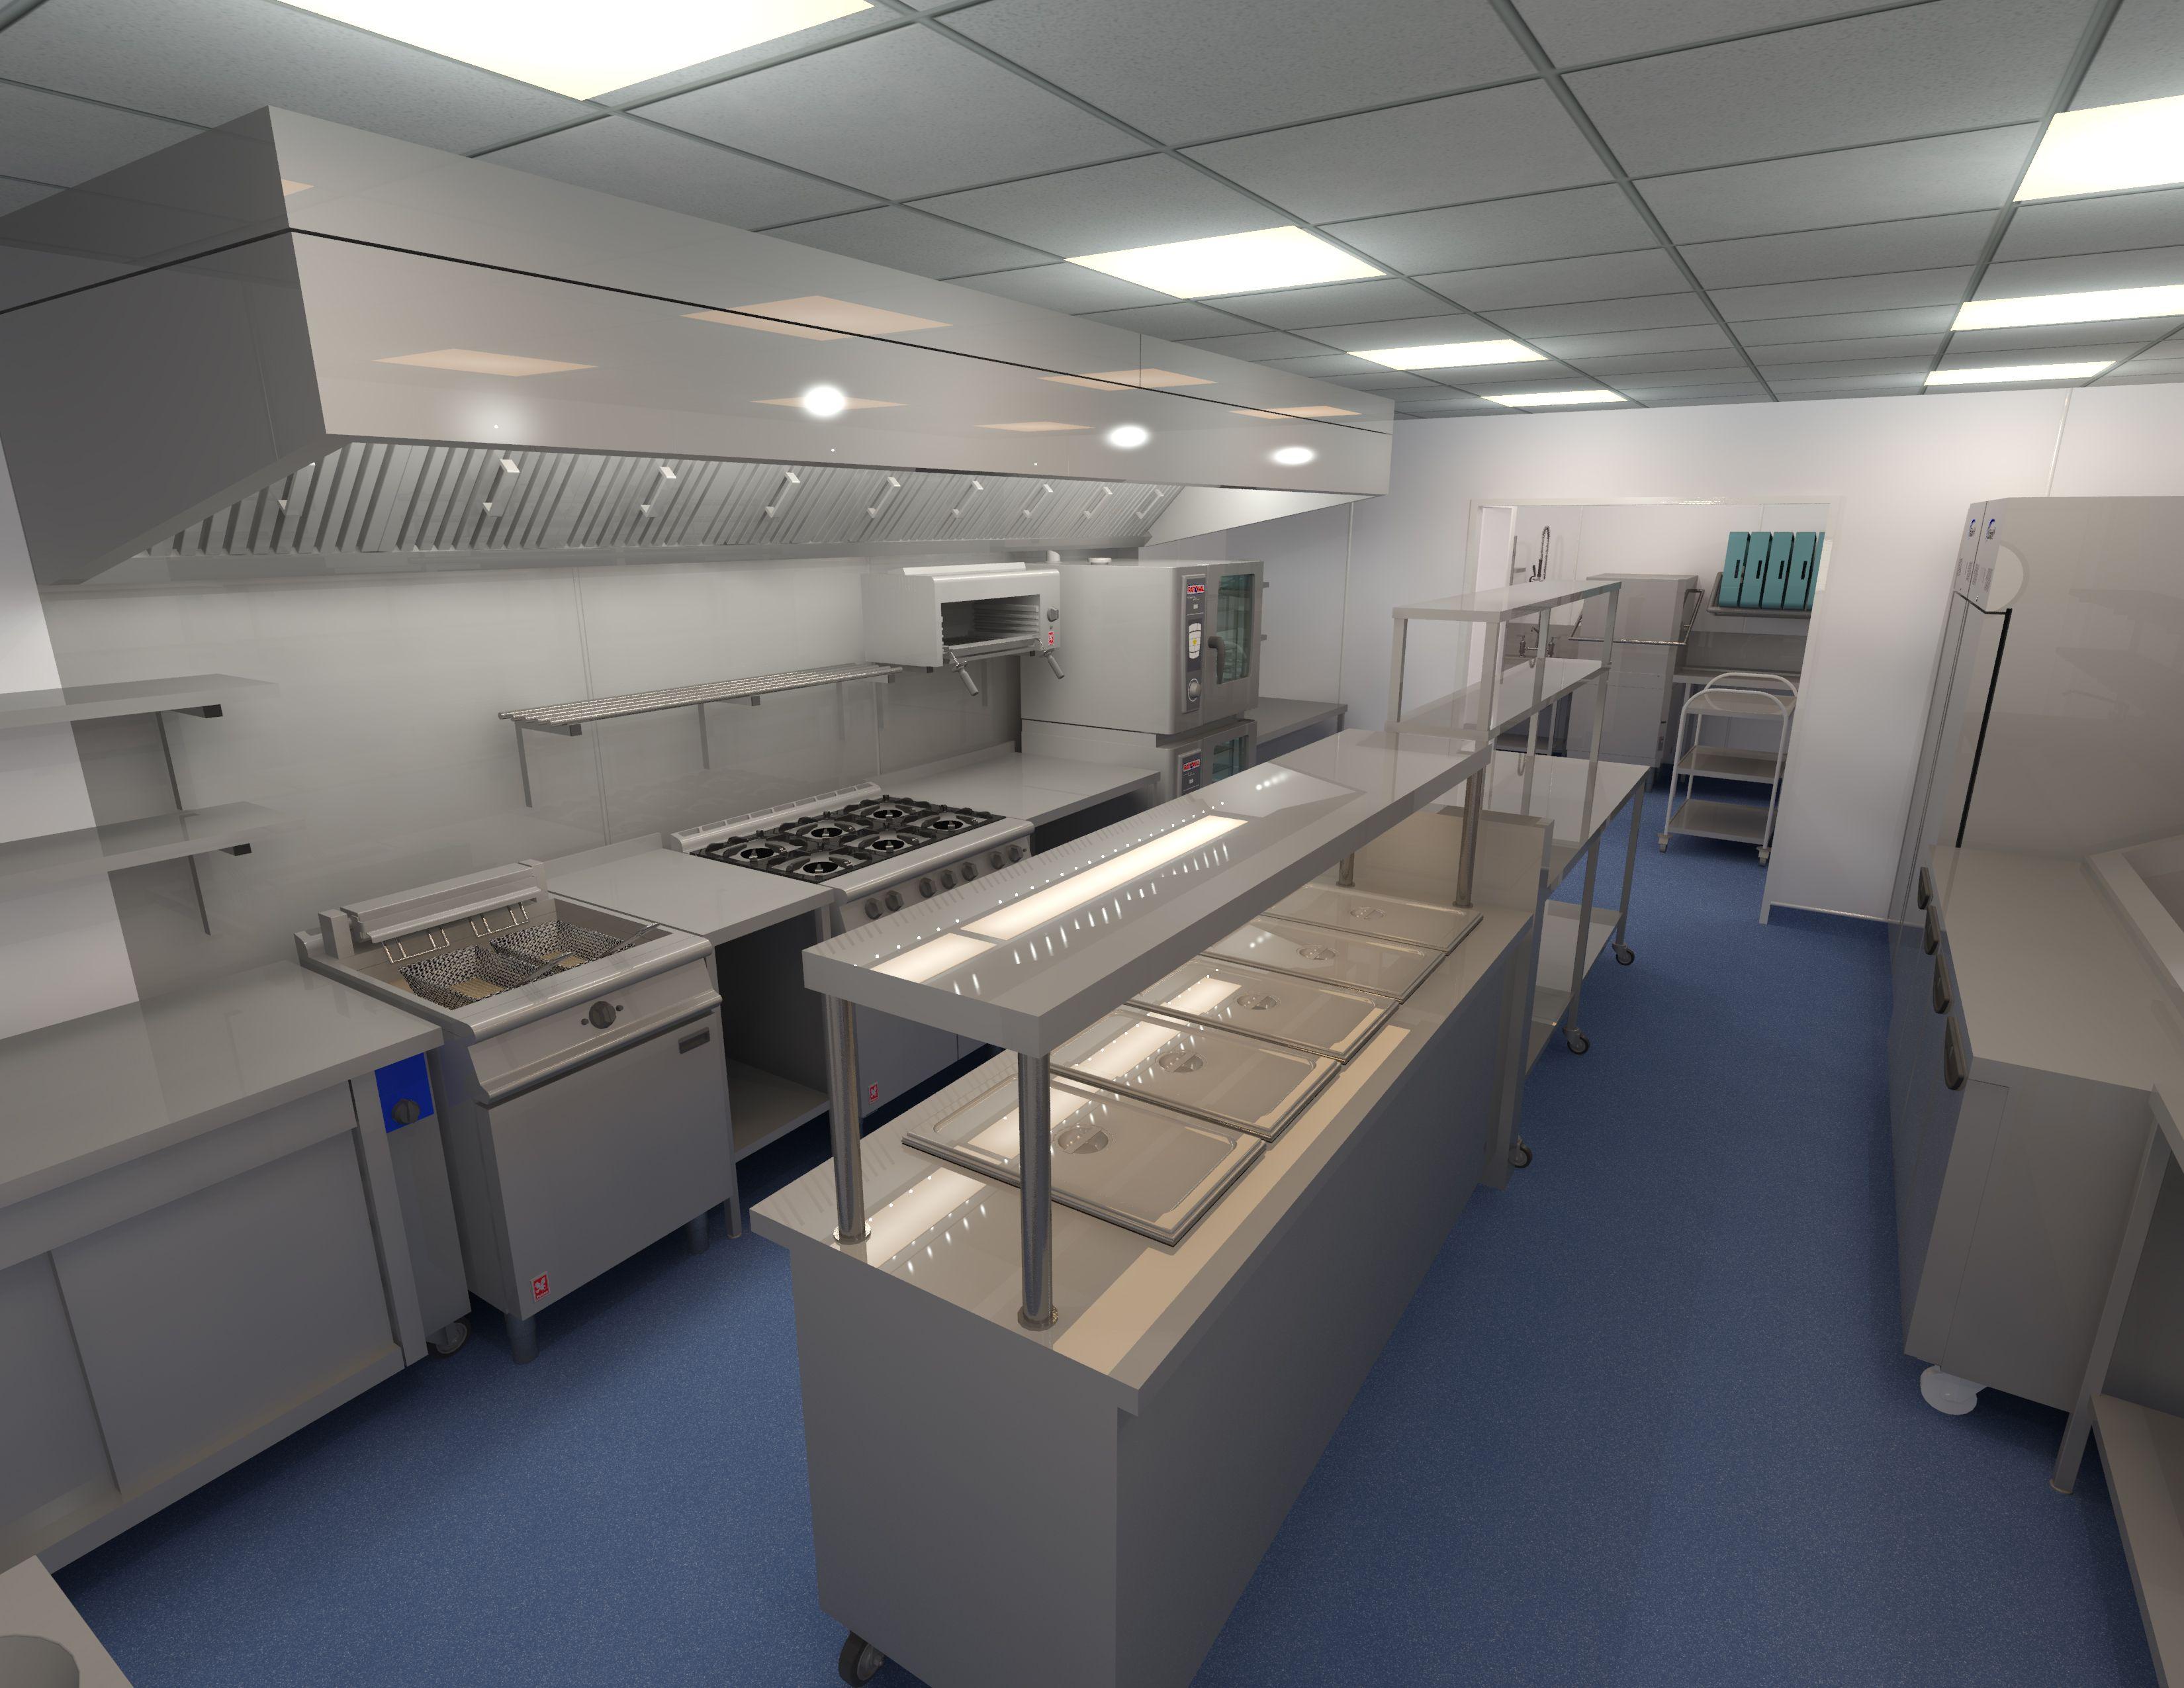 commercial kitchen design cad designs pinterest kitchen commercial kitchen design